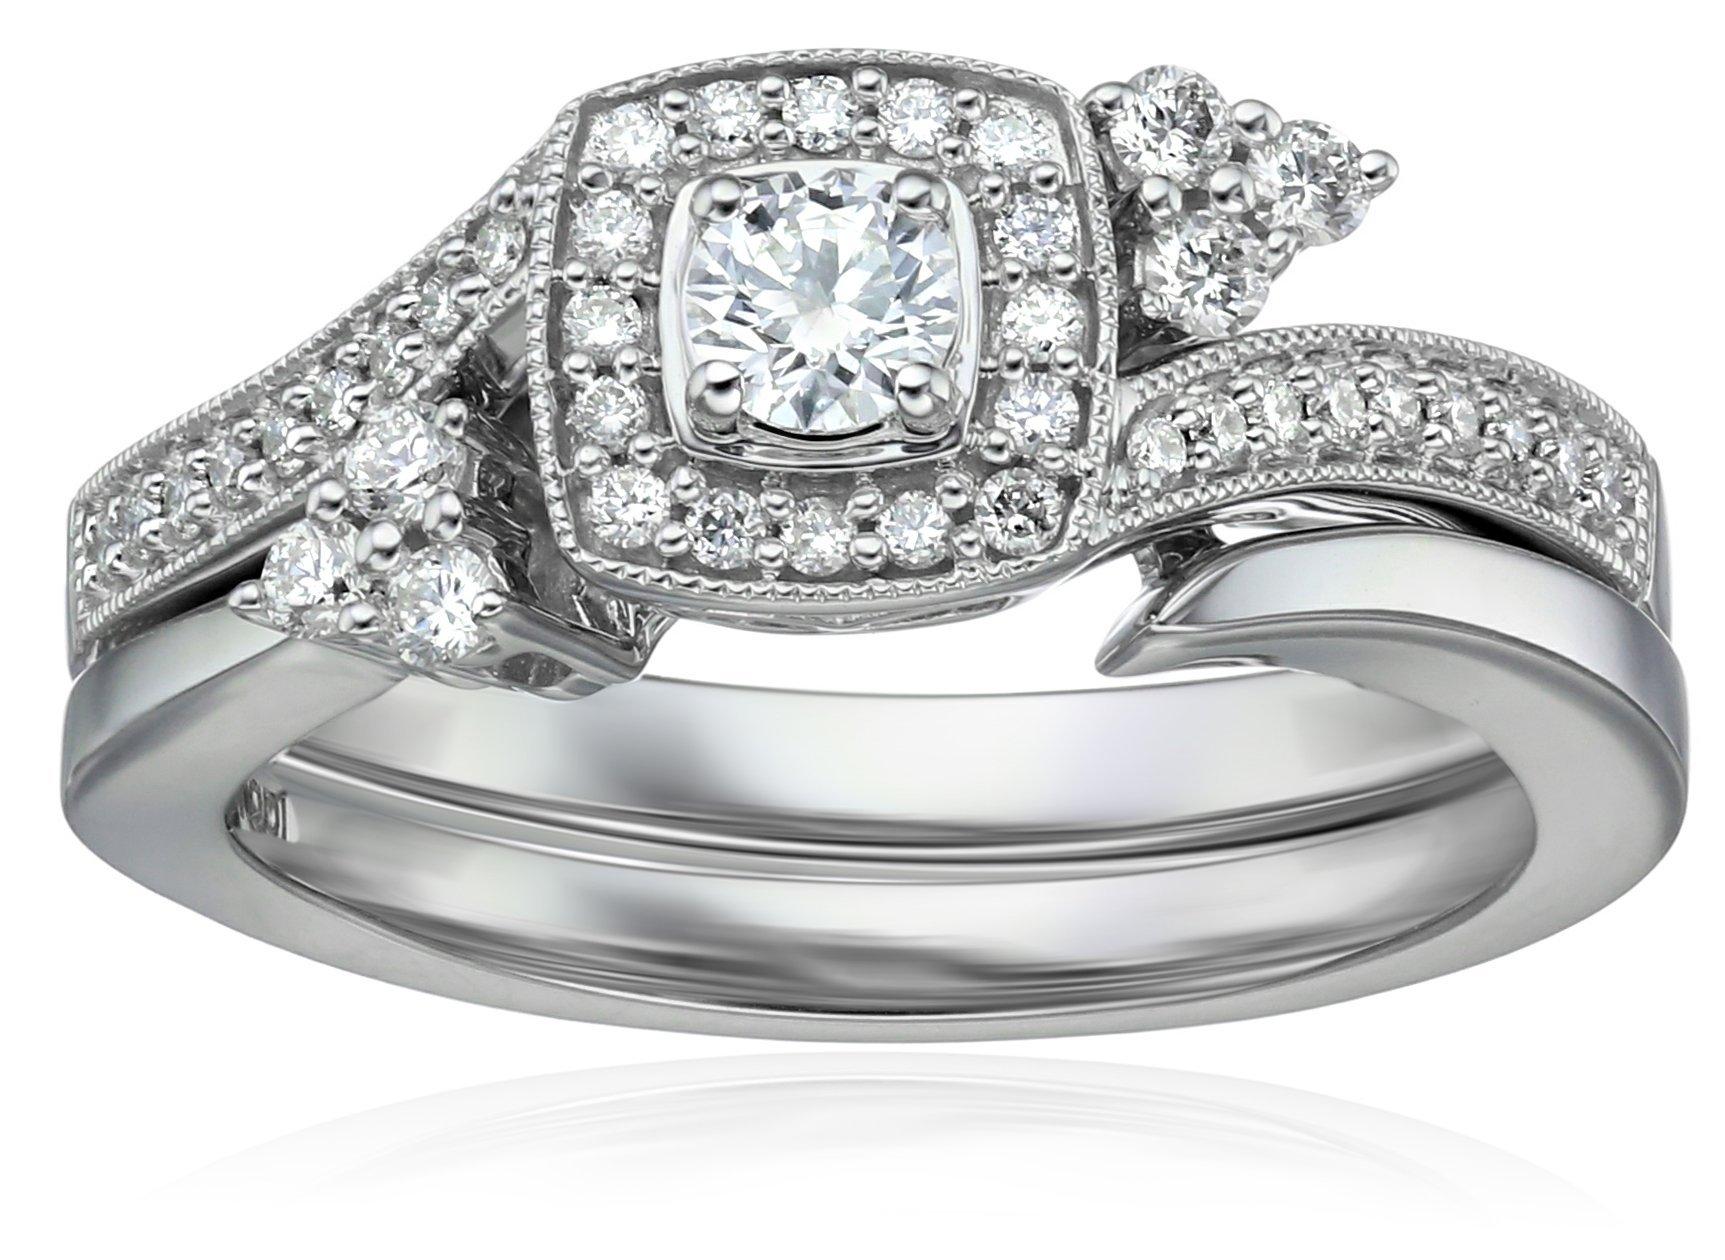 IGI Certified 14k White Gold Diamond Cushion Halo with Millgrain Wedding Ring Set (1/2cttw, H-I Color, I1-I2 Clarity), Size 7